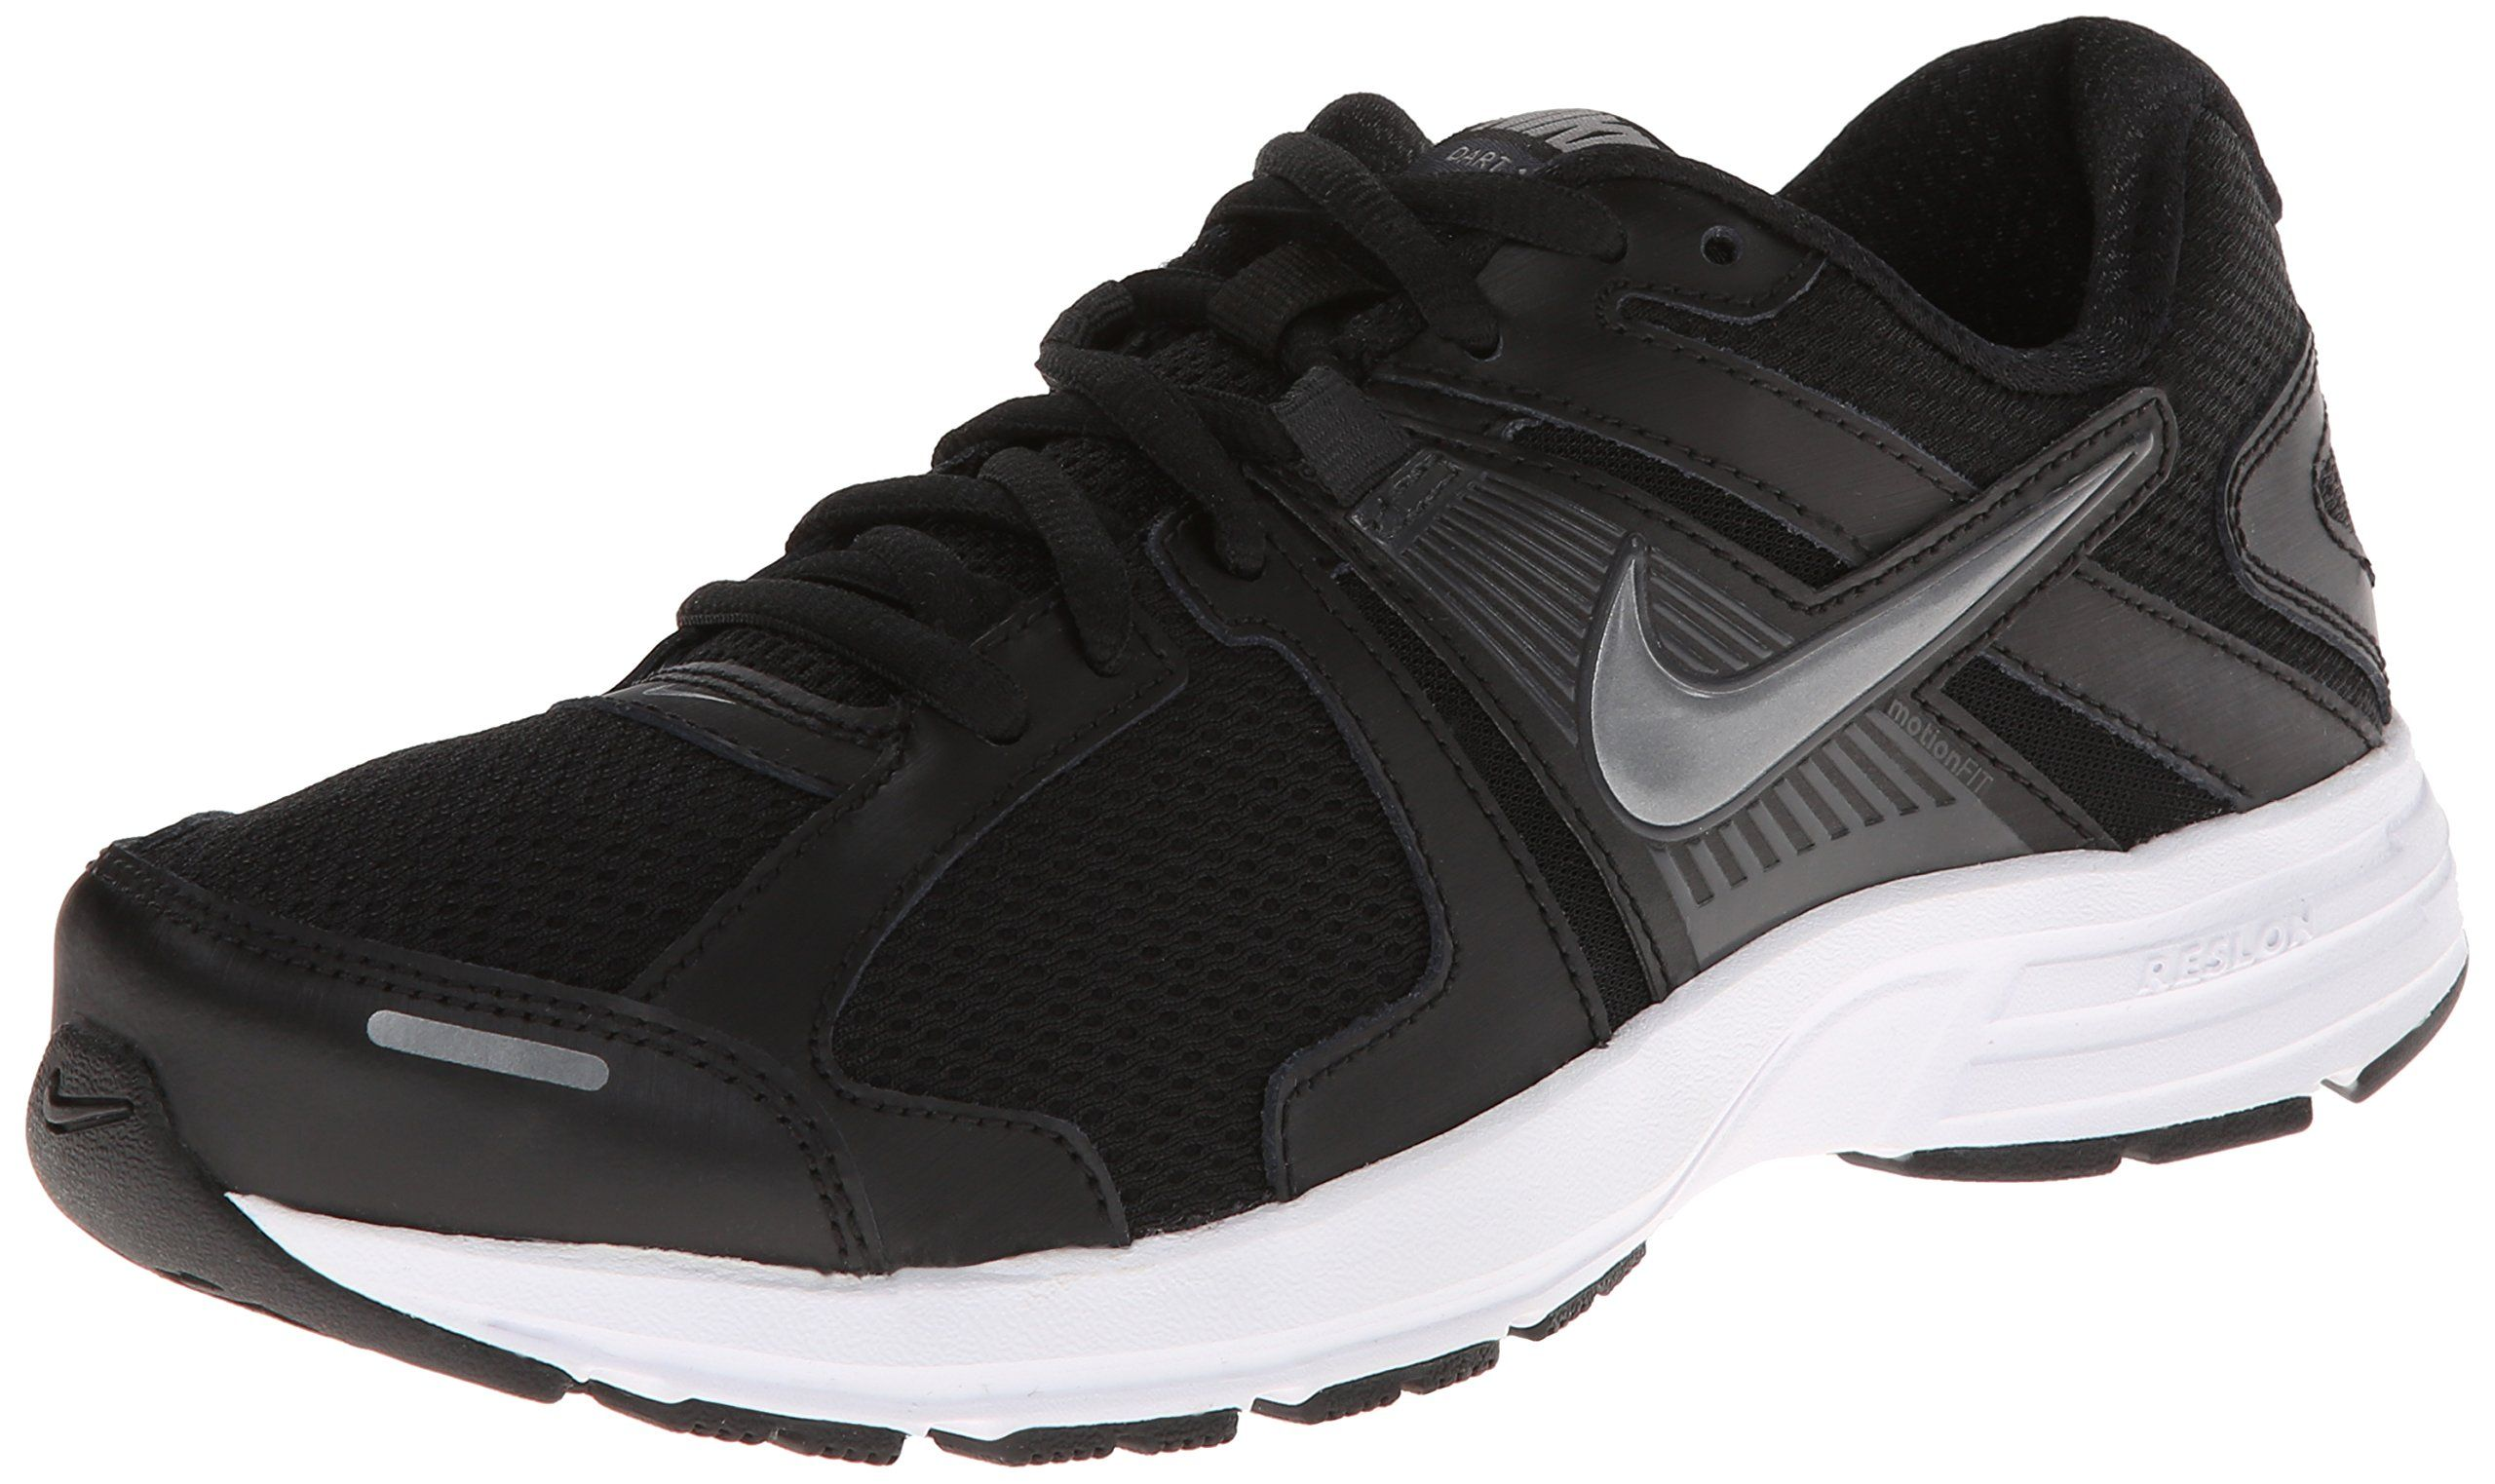 a34a49578011e Amazon.com  Nike Mens Dart 10 Running Shoes  Clothing